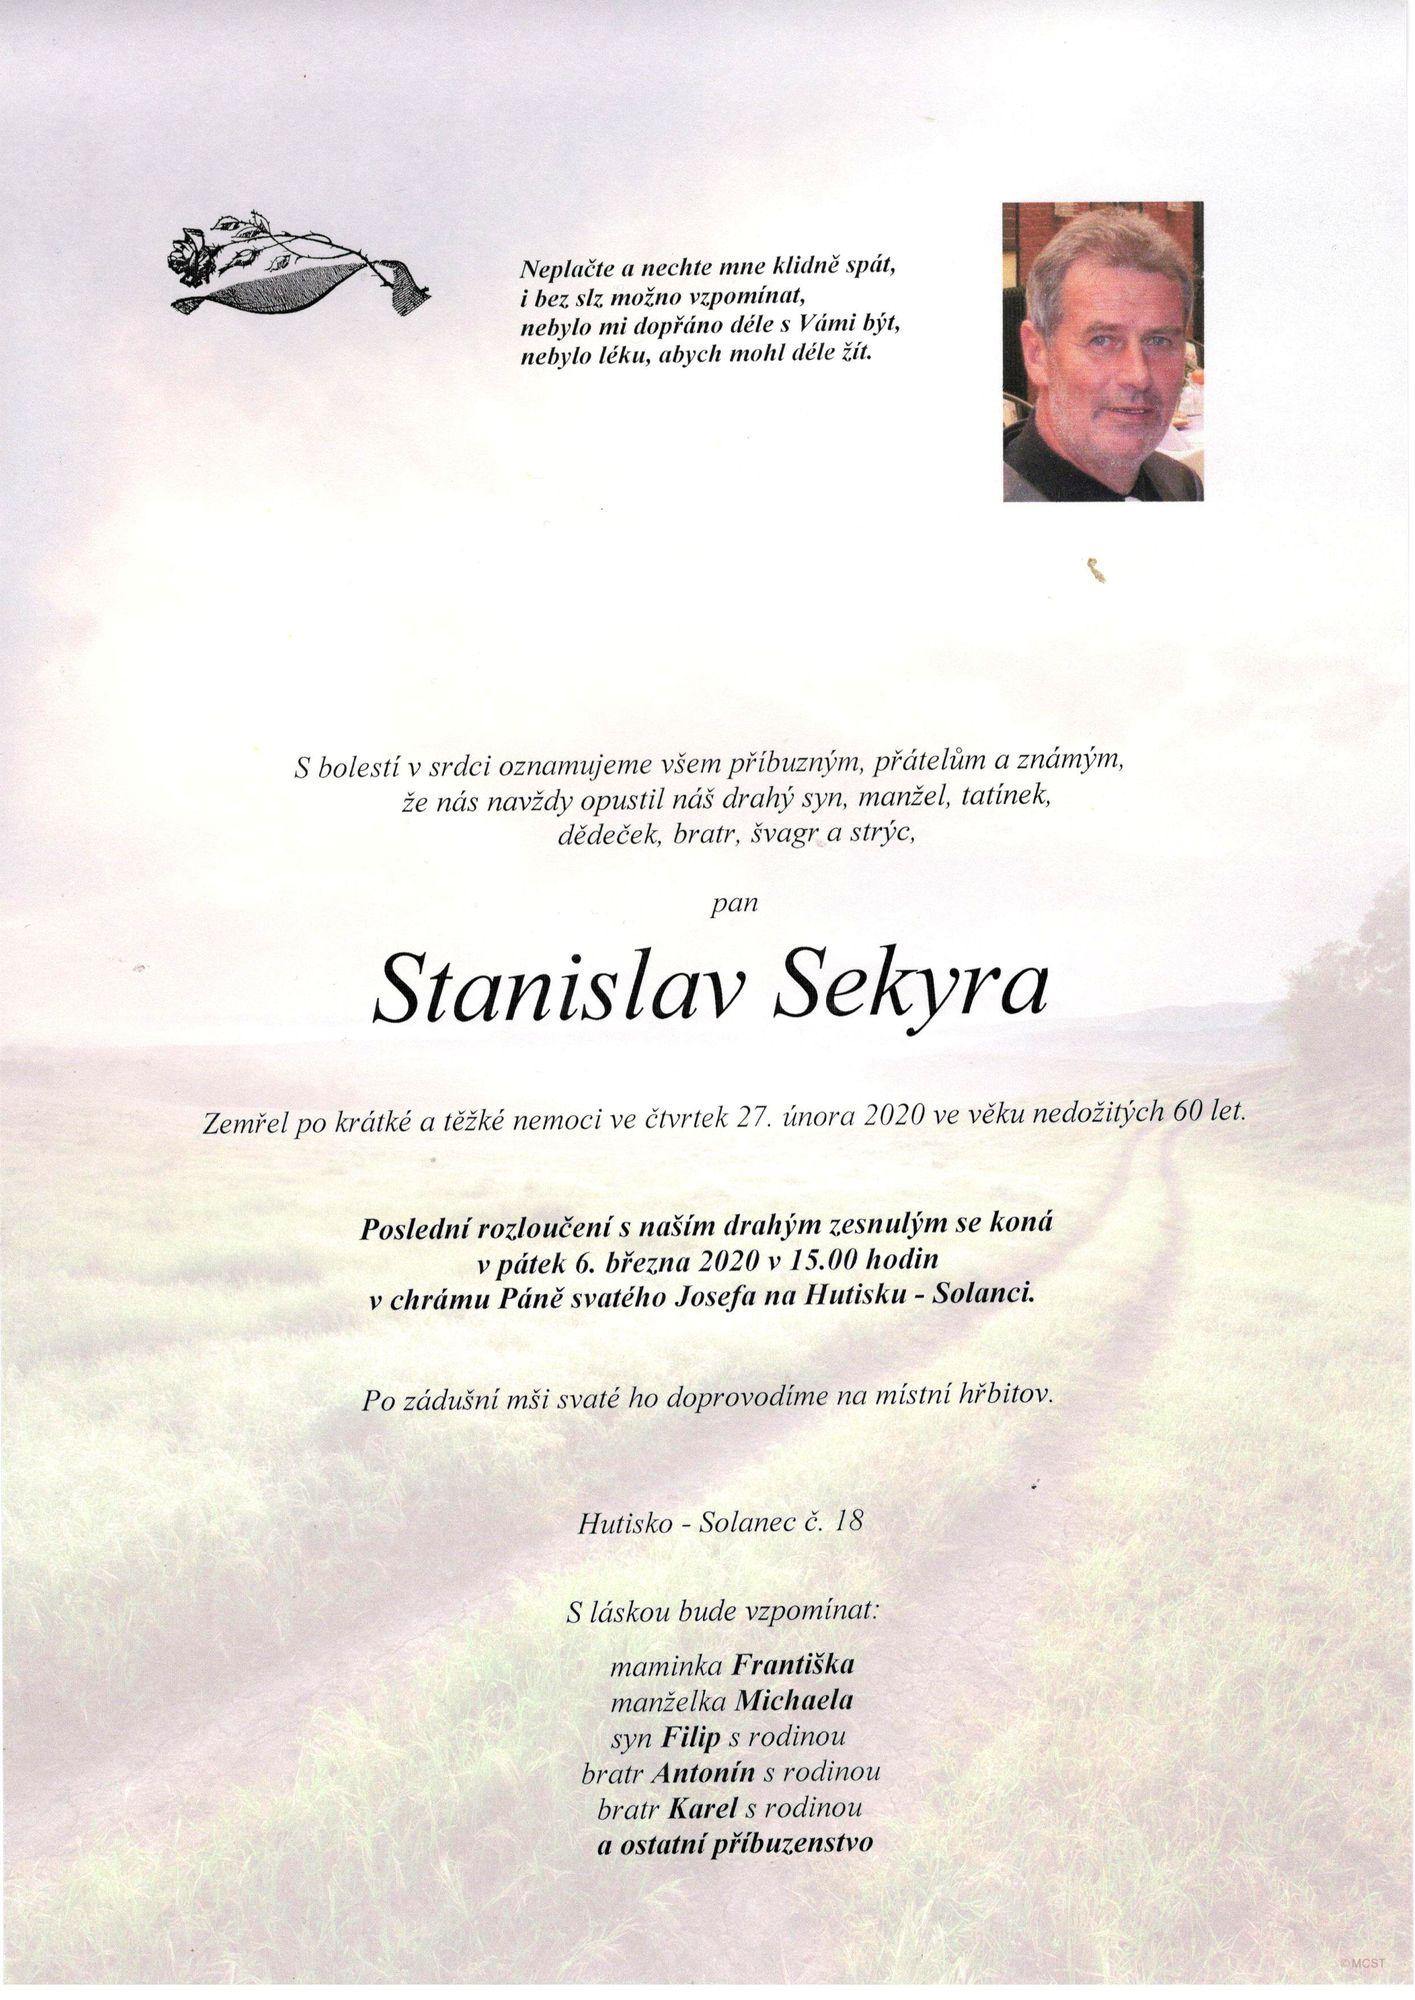 Stanislav Sekyra